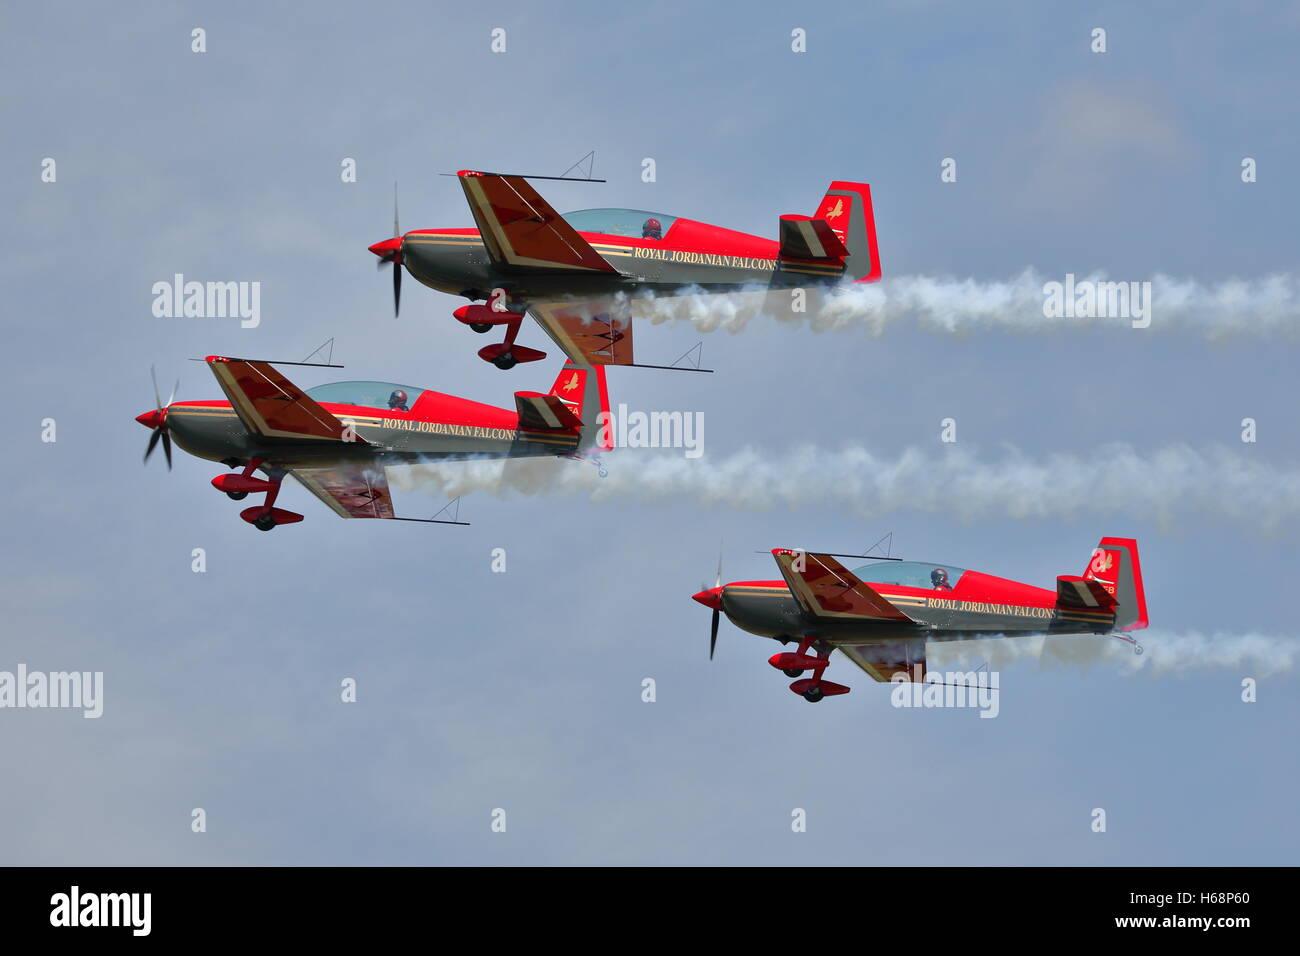 Royal Jordanian Falcons at the RIAT Fairford 2014 - Stock Image